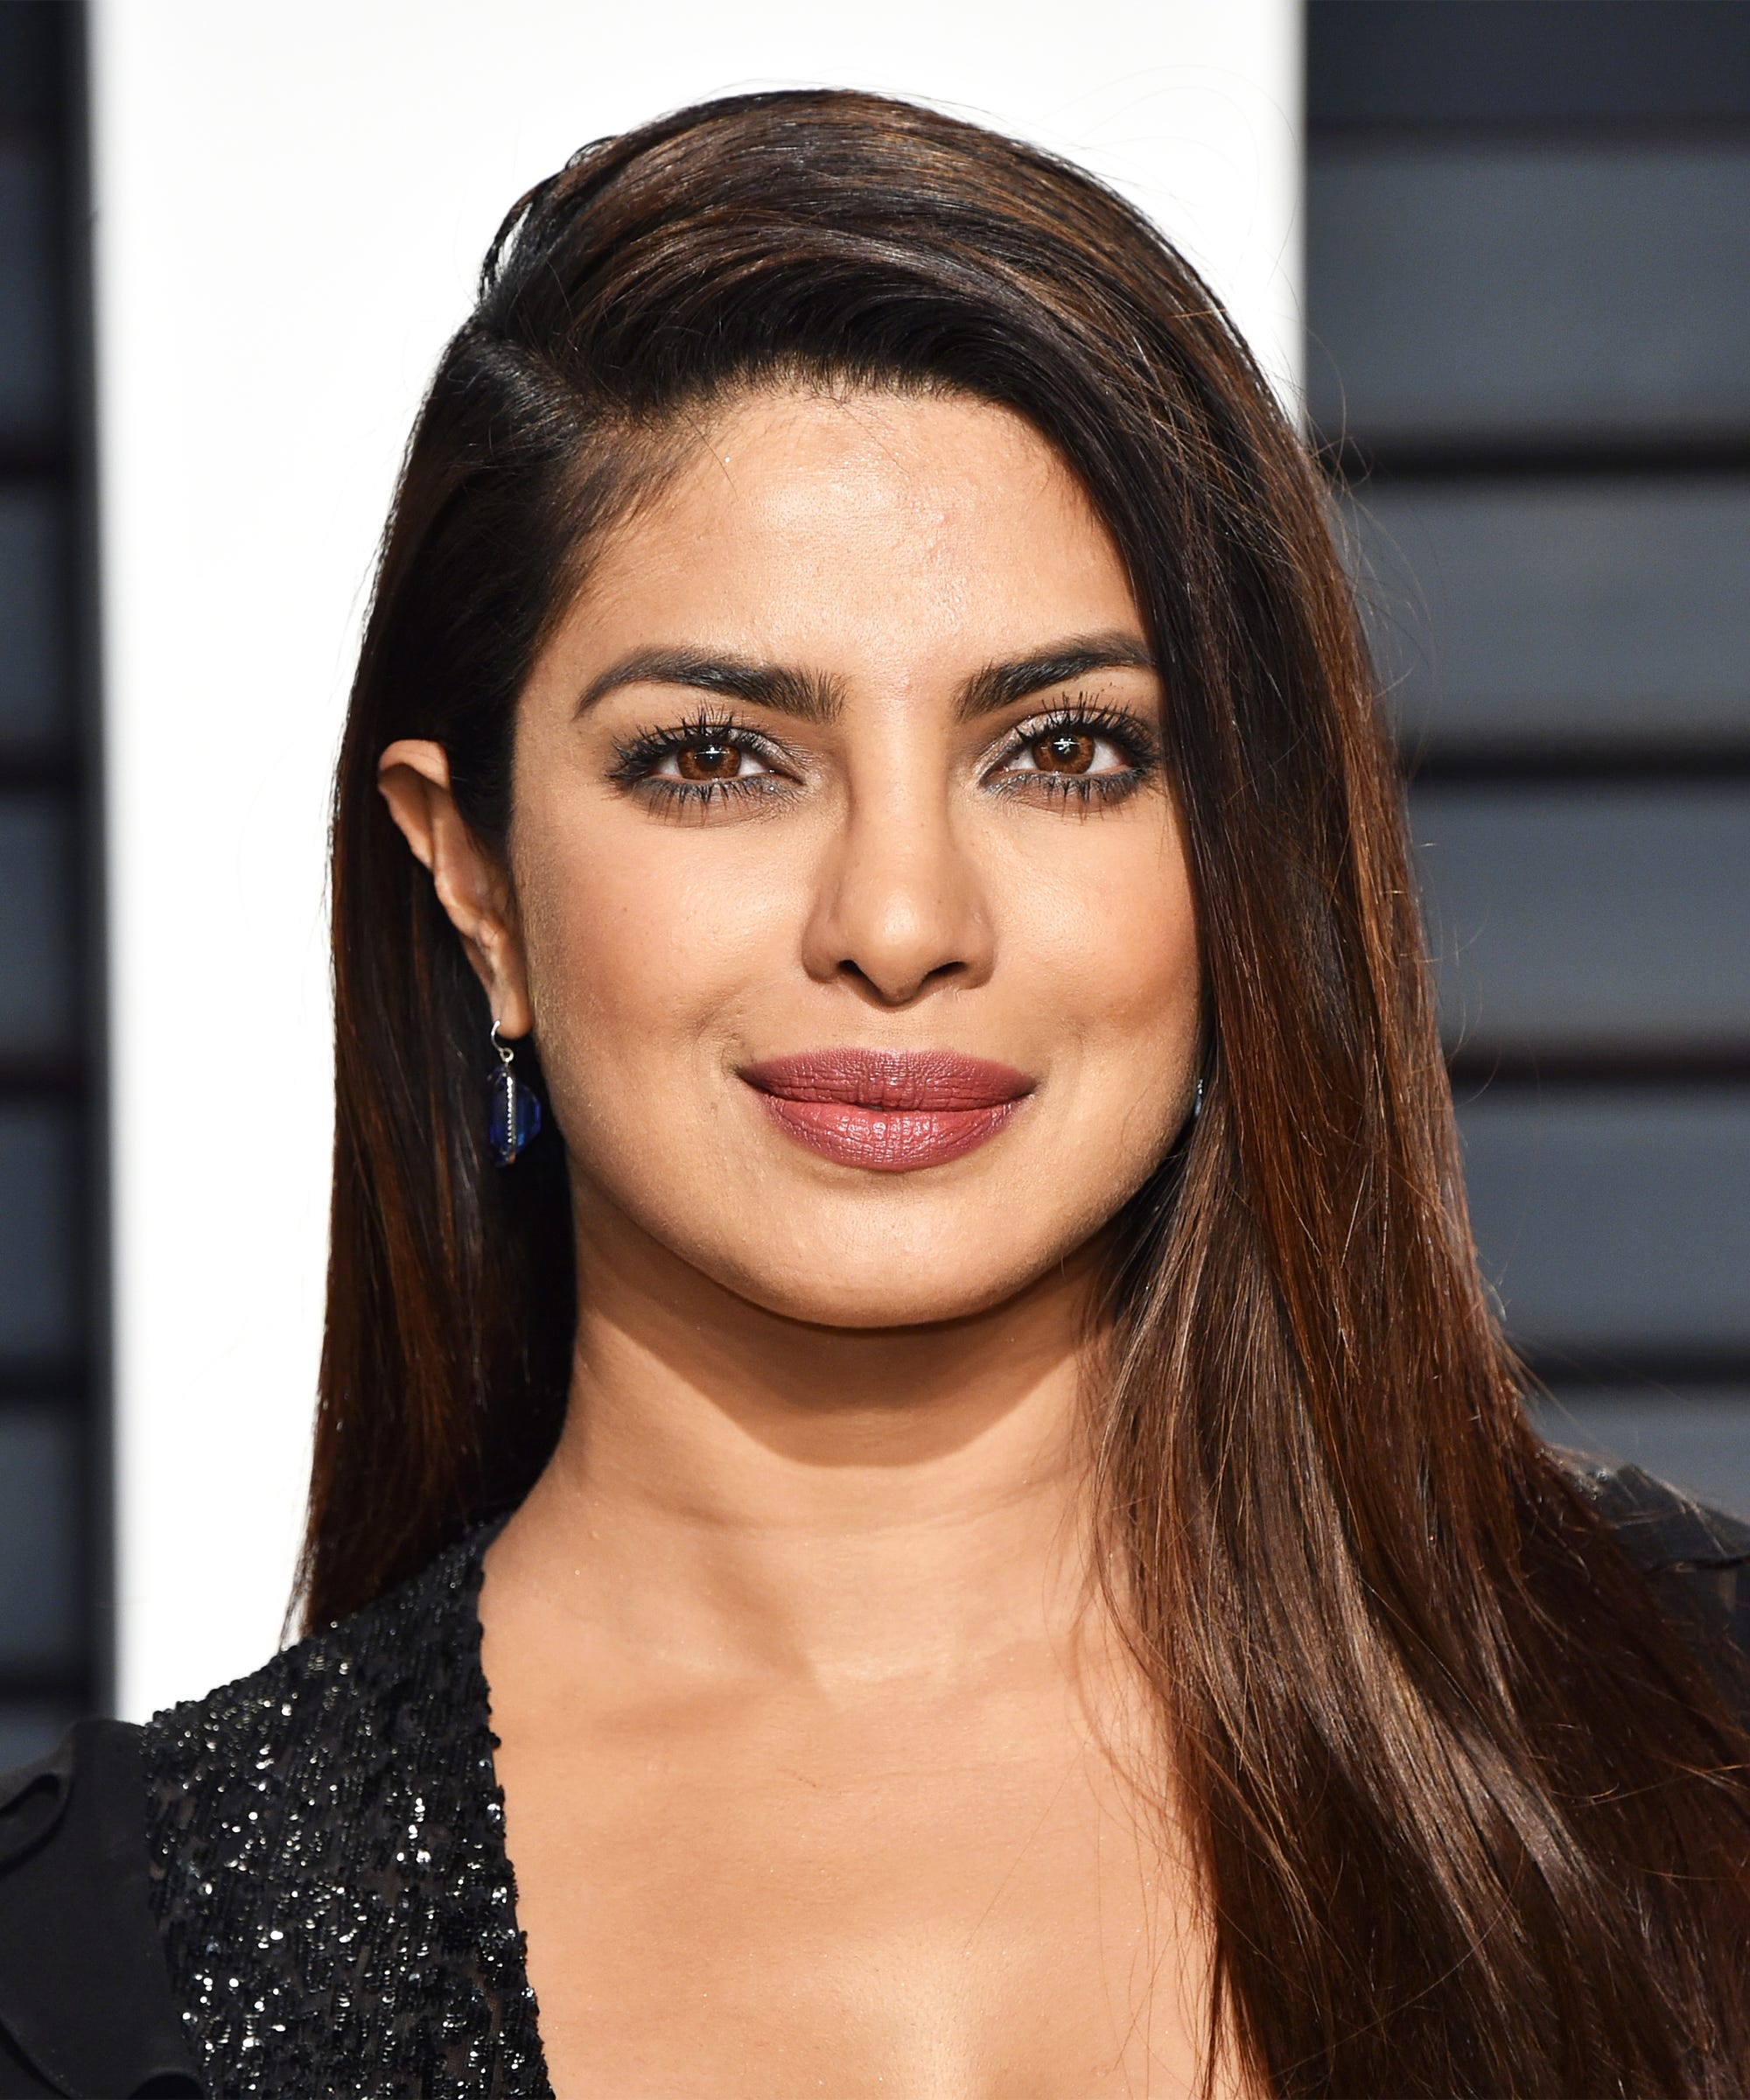 ICloud Priyanka Chopra nudes (41 foto and video), Tits, Fappening, Boobs, bra 2019